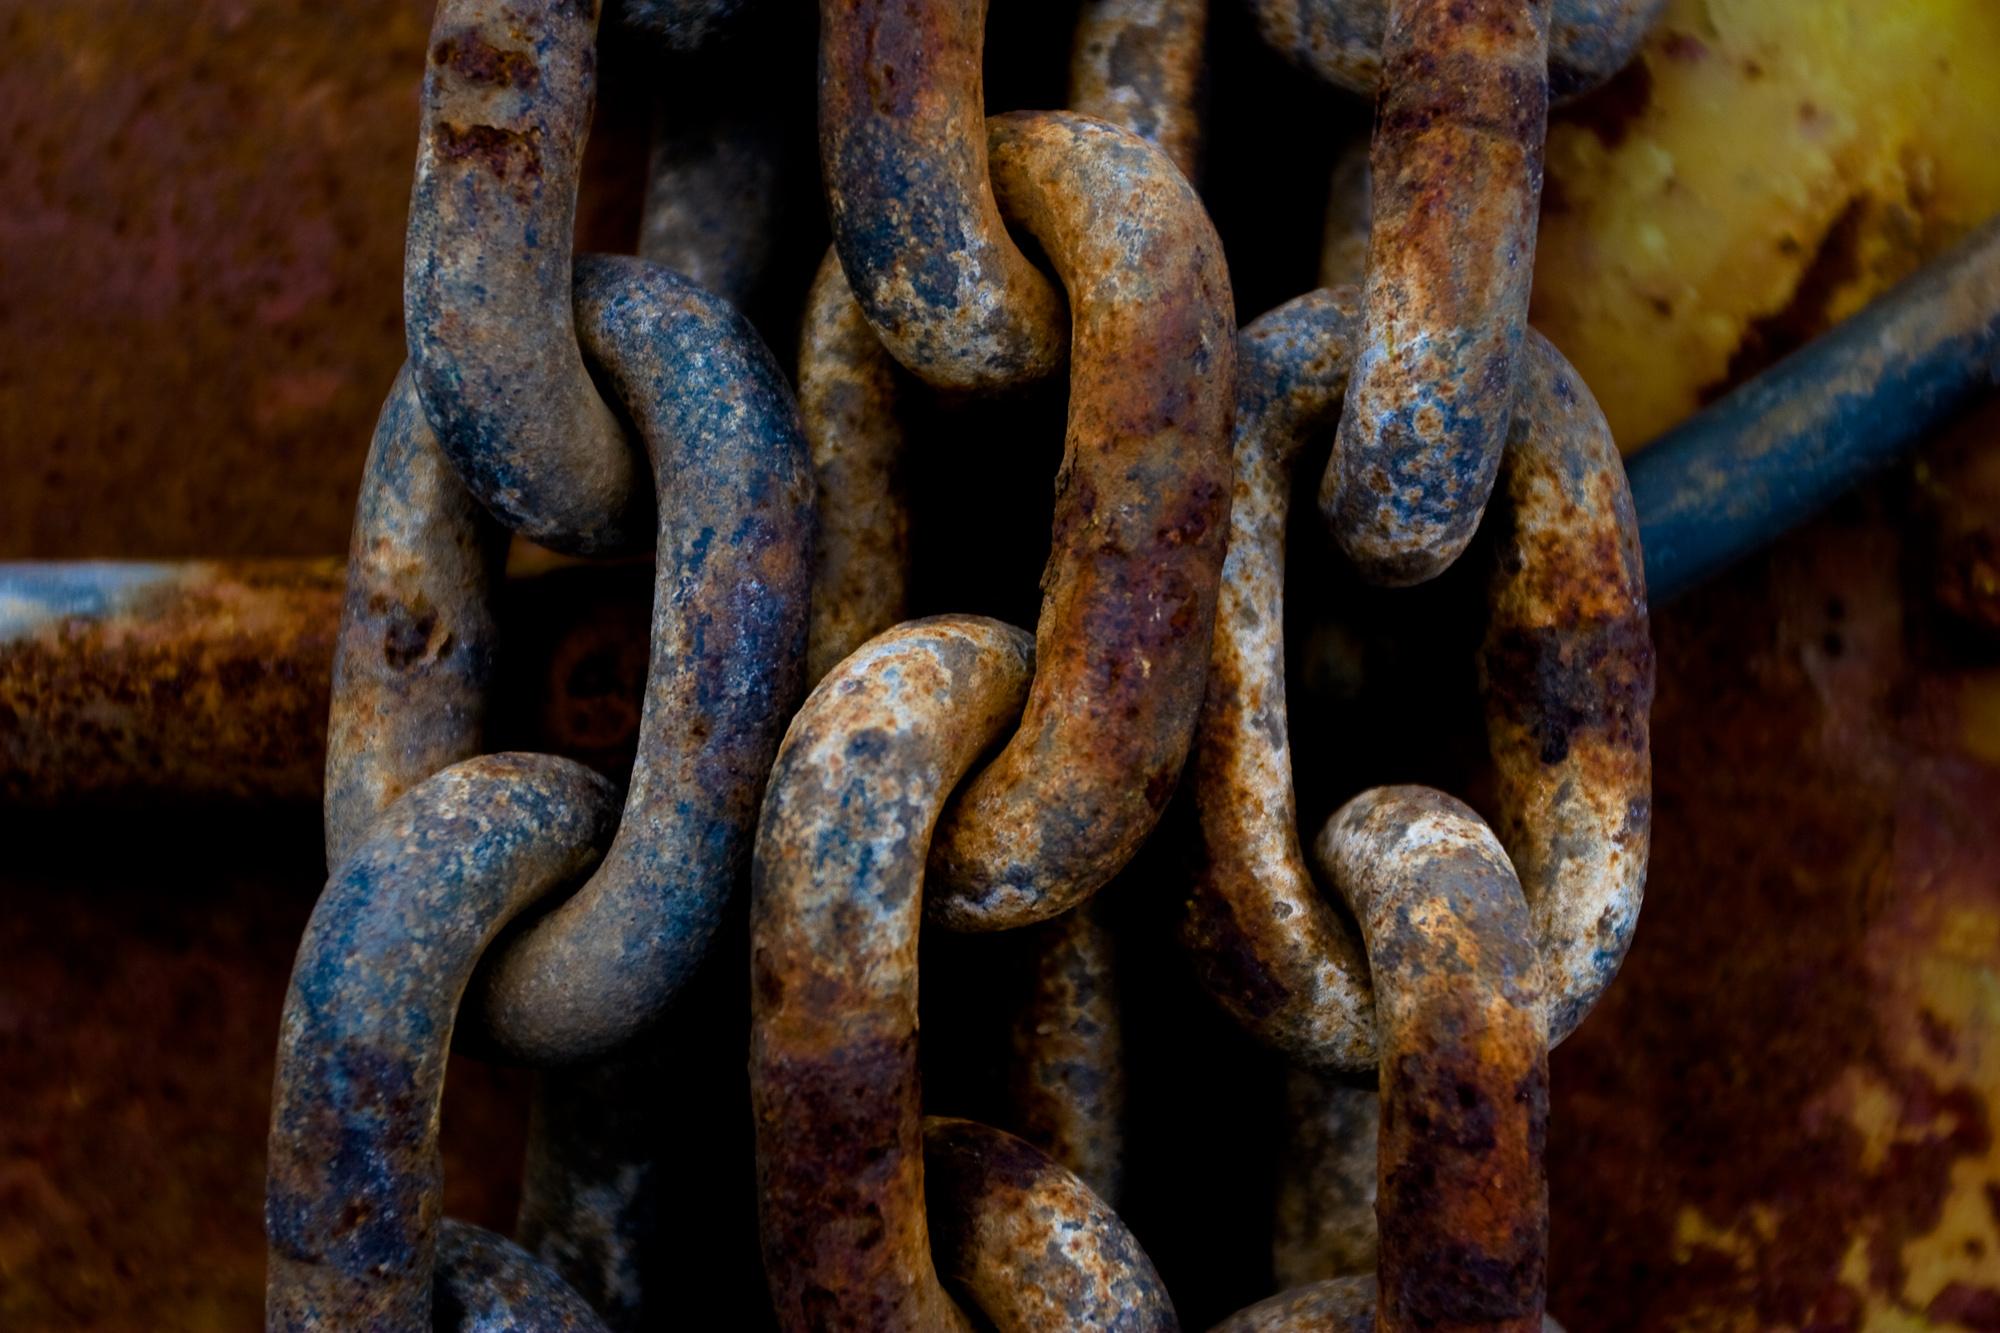 Rusty chains photo